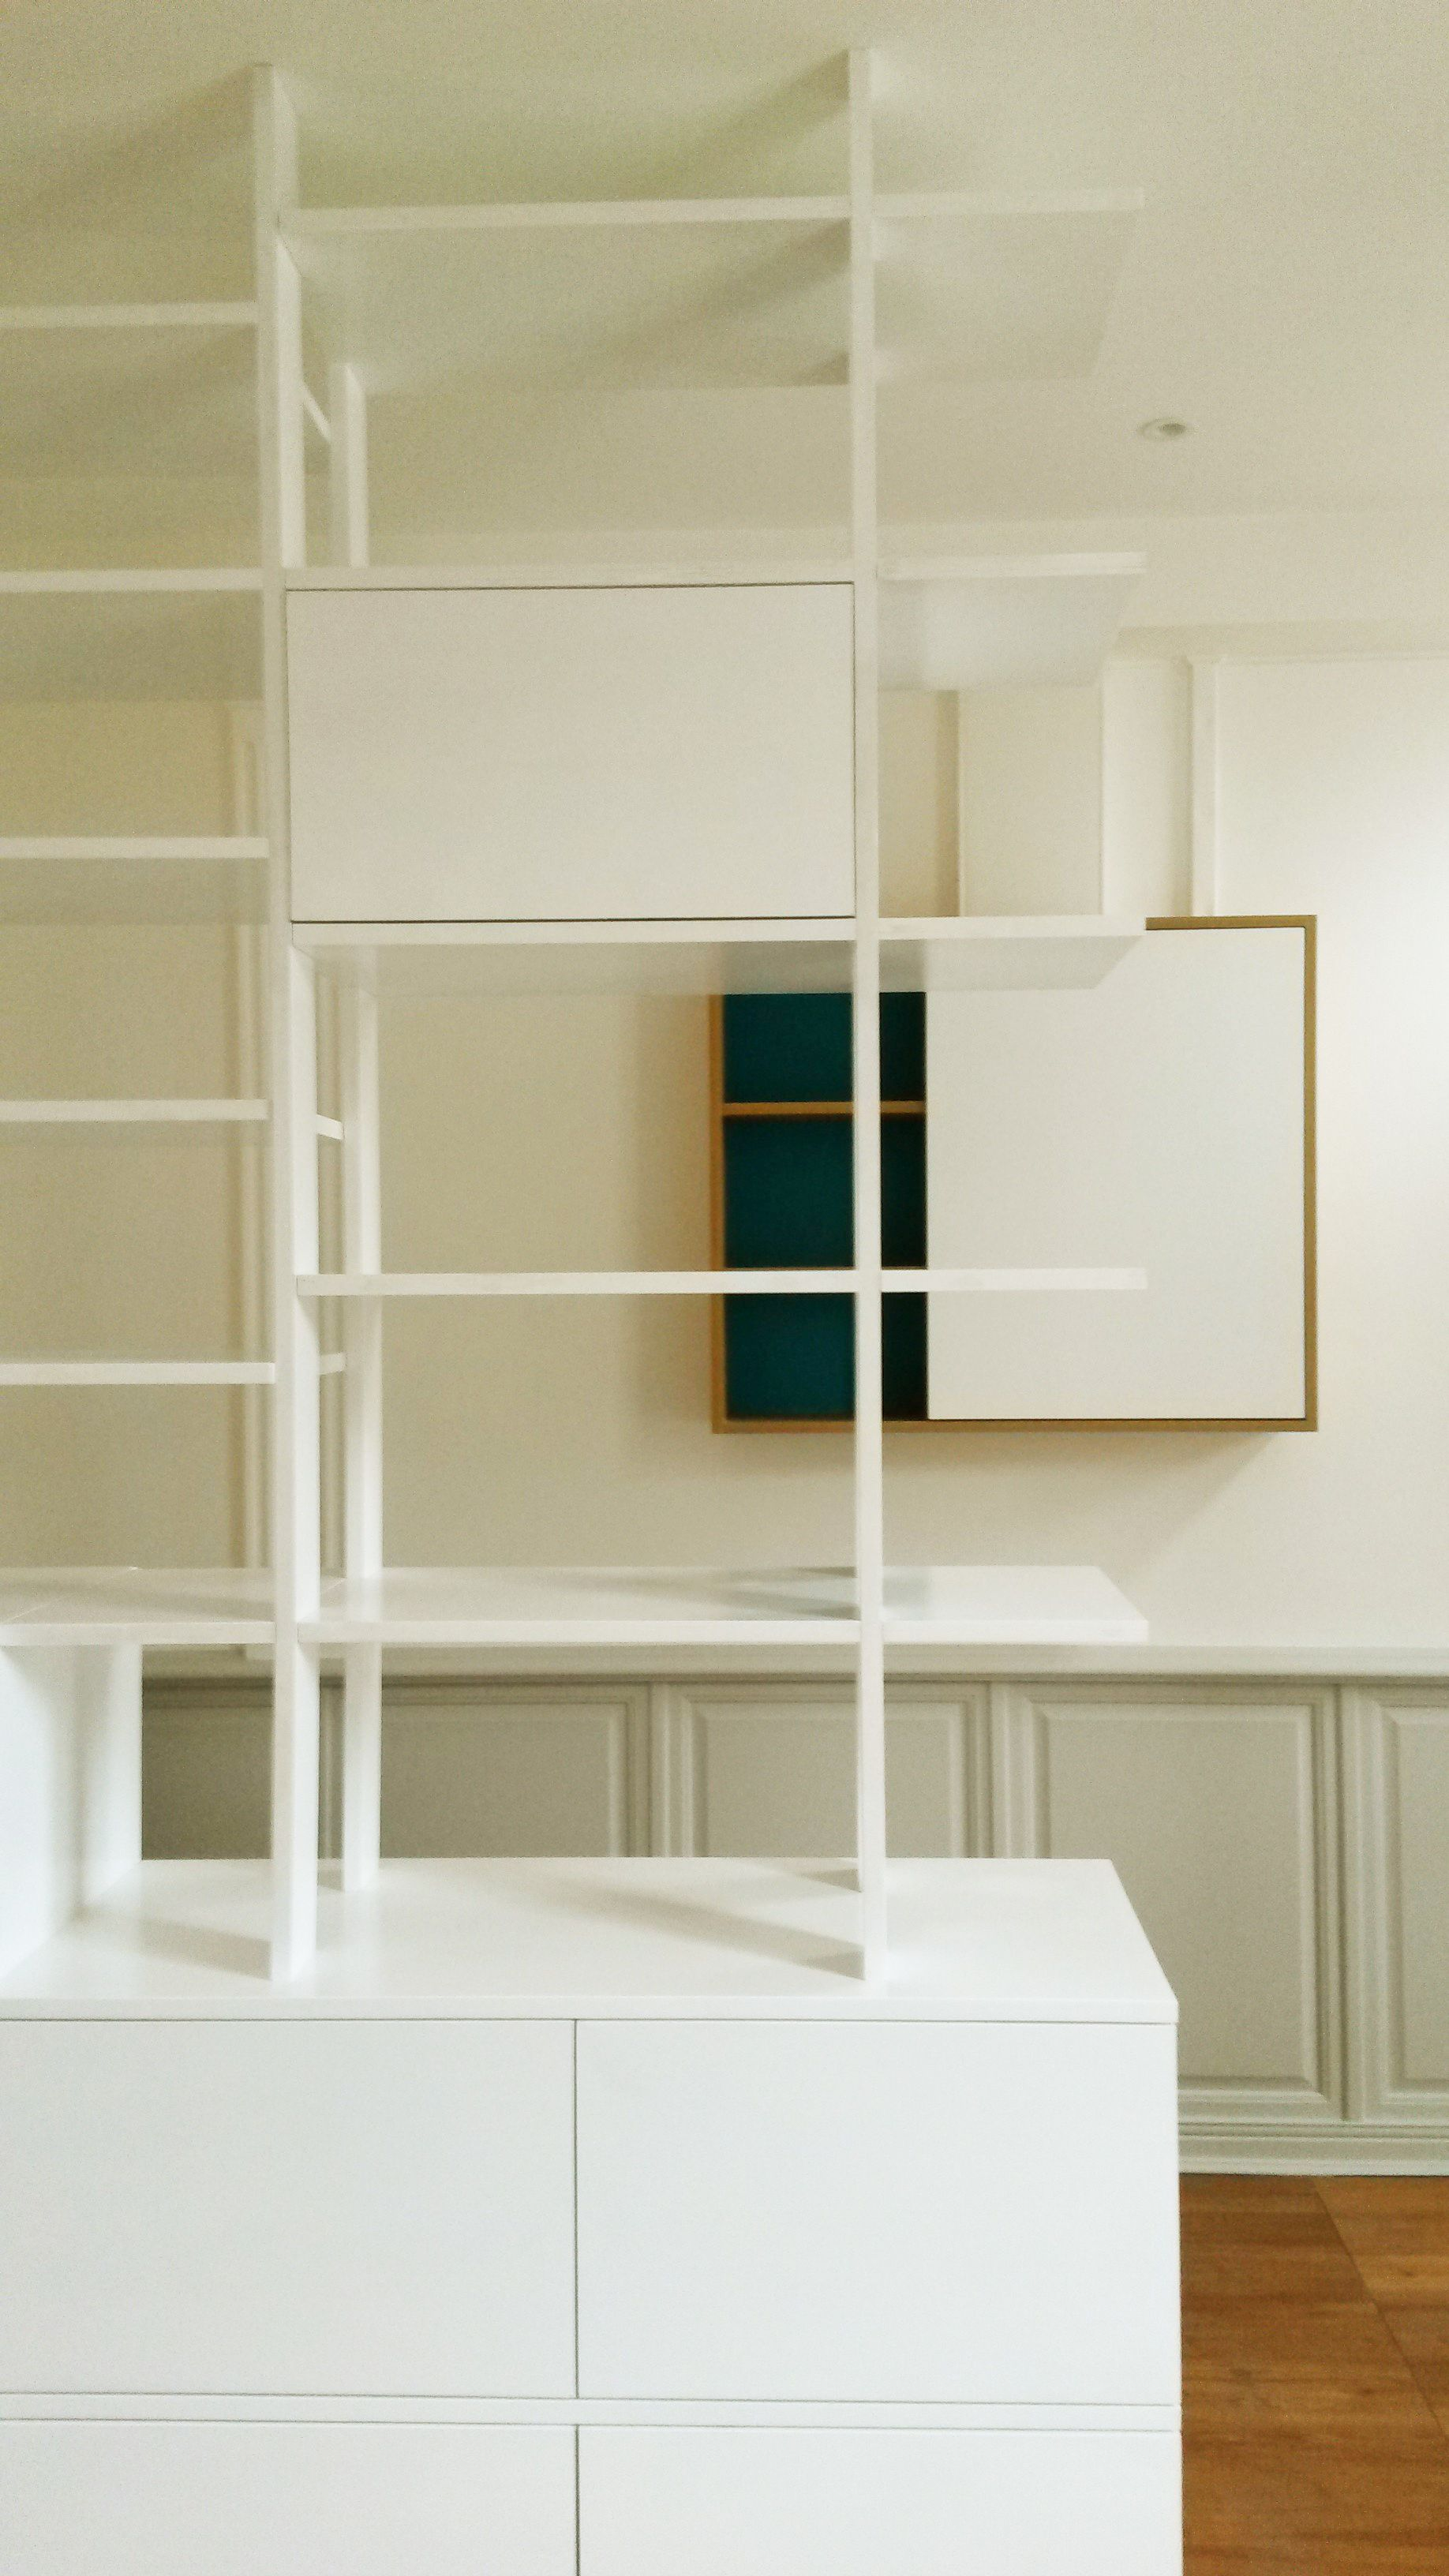 dressing tout en un great lovely dressing tout en un with dressing tout en un interesting nice. Black Bedroom Furniture Sets. Home Design Ideas